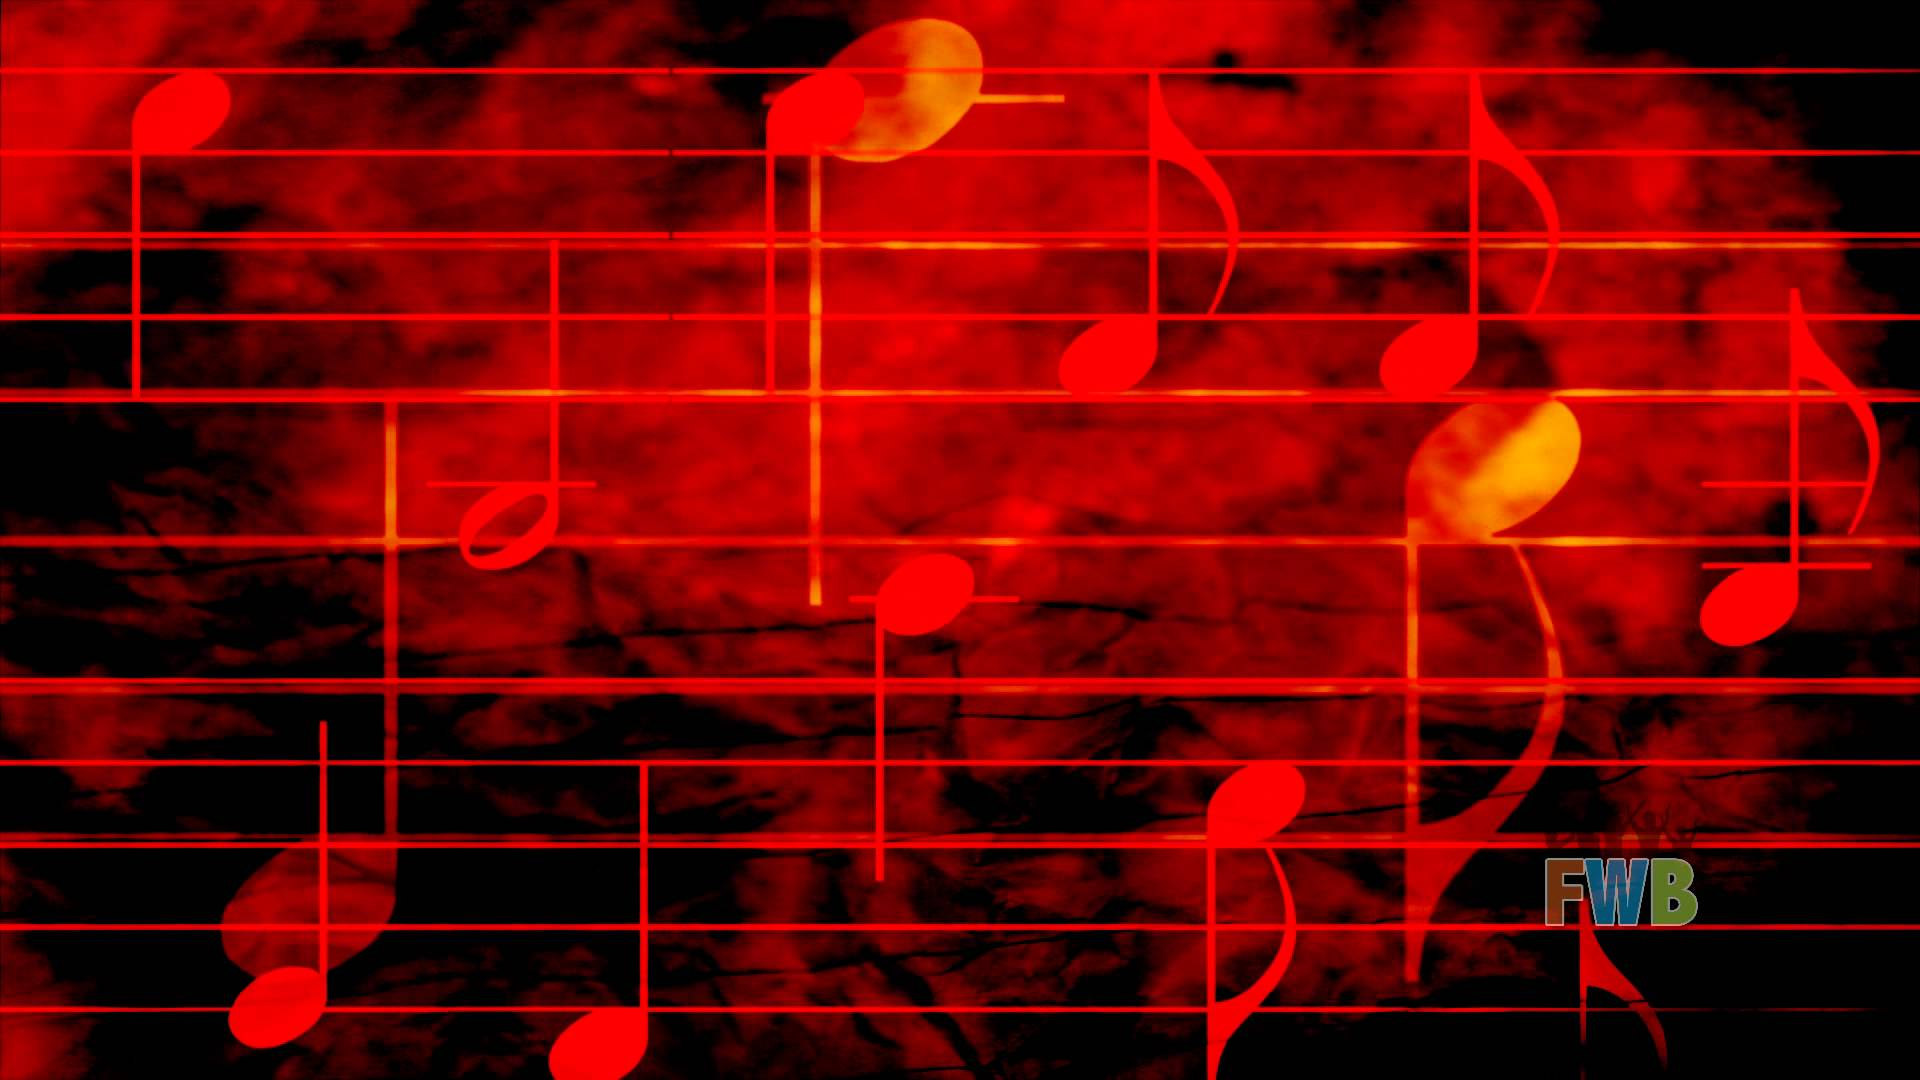 gospel music wallpaper 1280x800 - photo #9